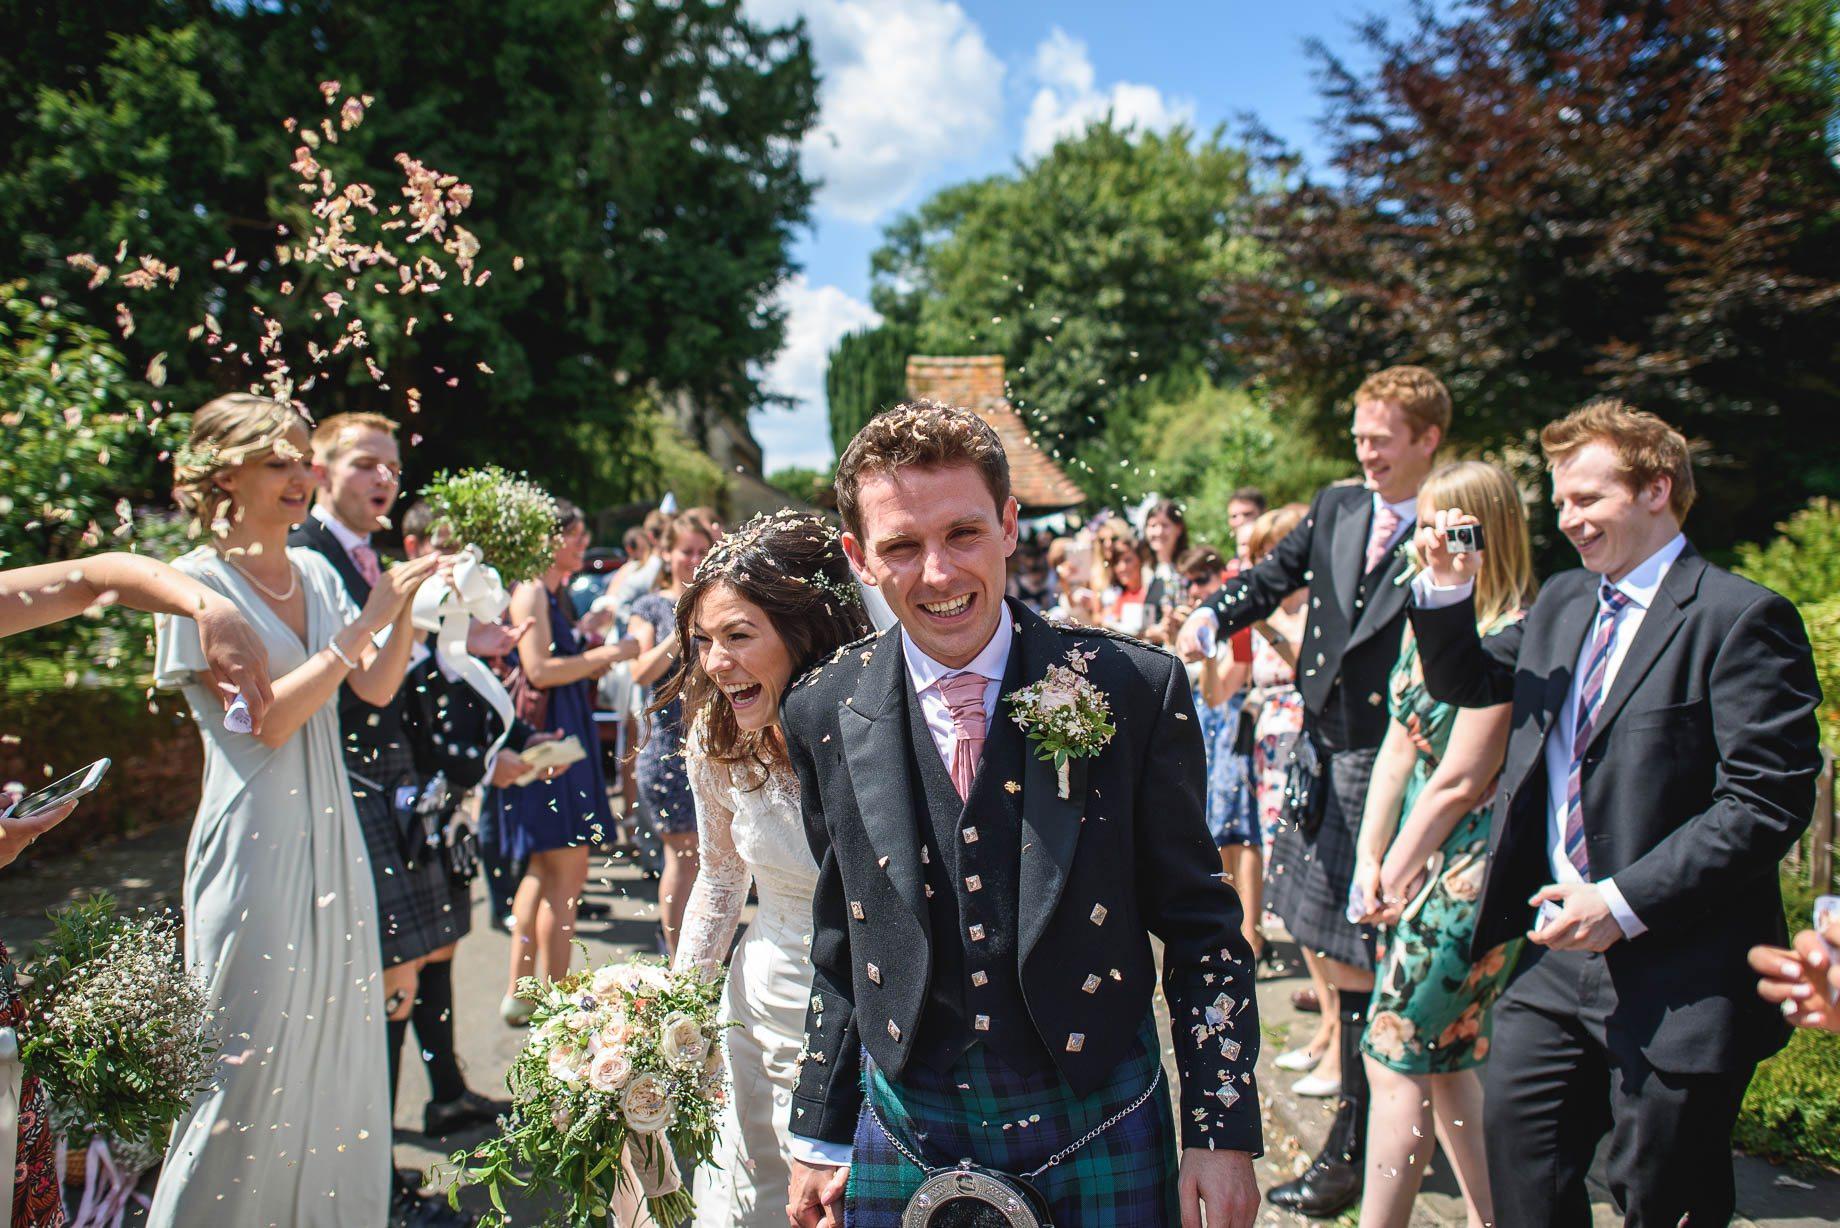 Gildings Barn wedding photography - Sarah and Steve (86 of 190)